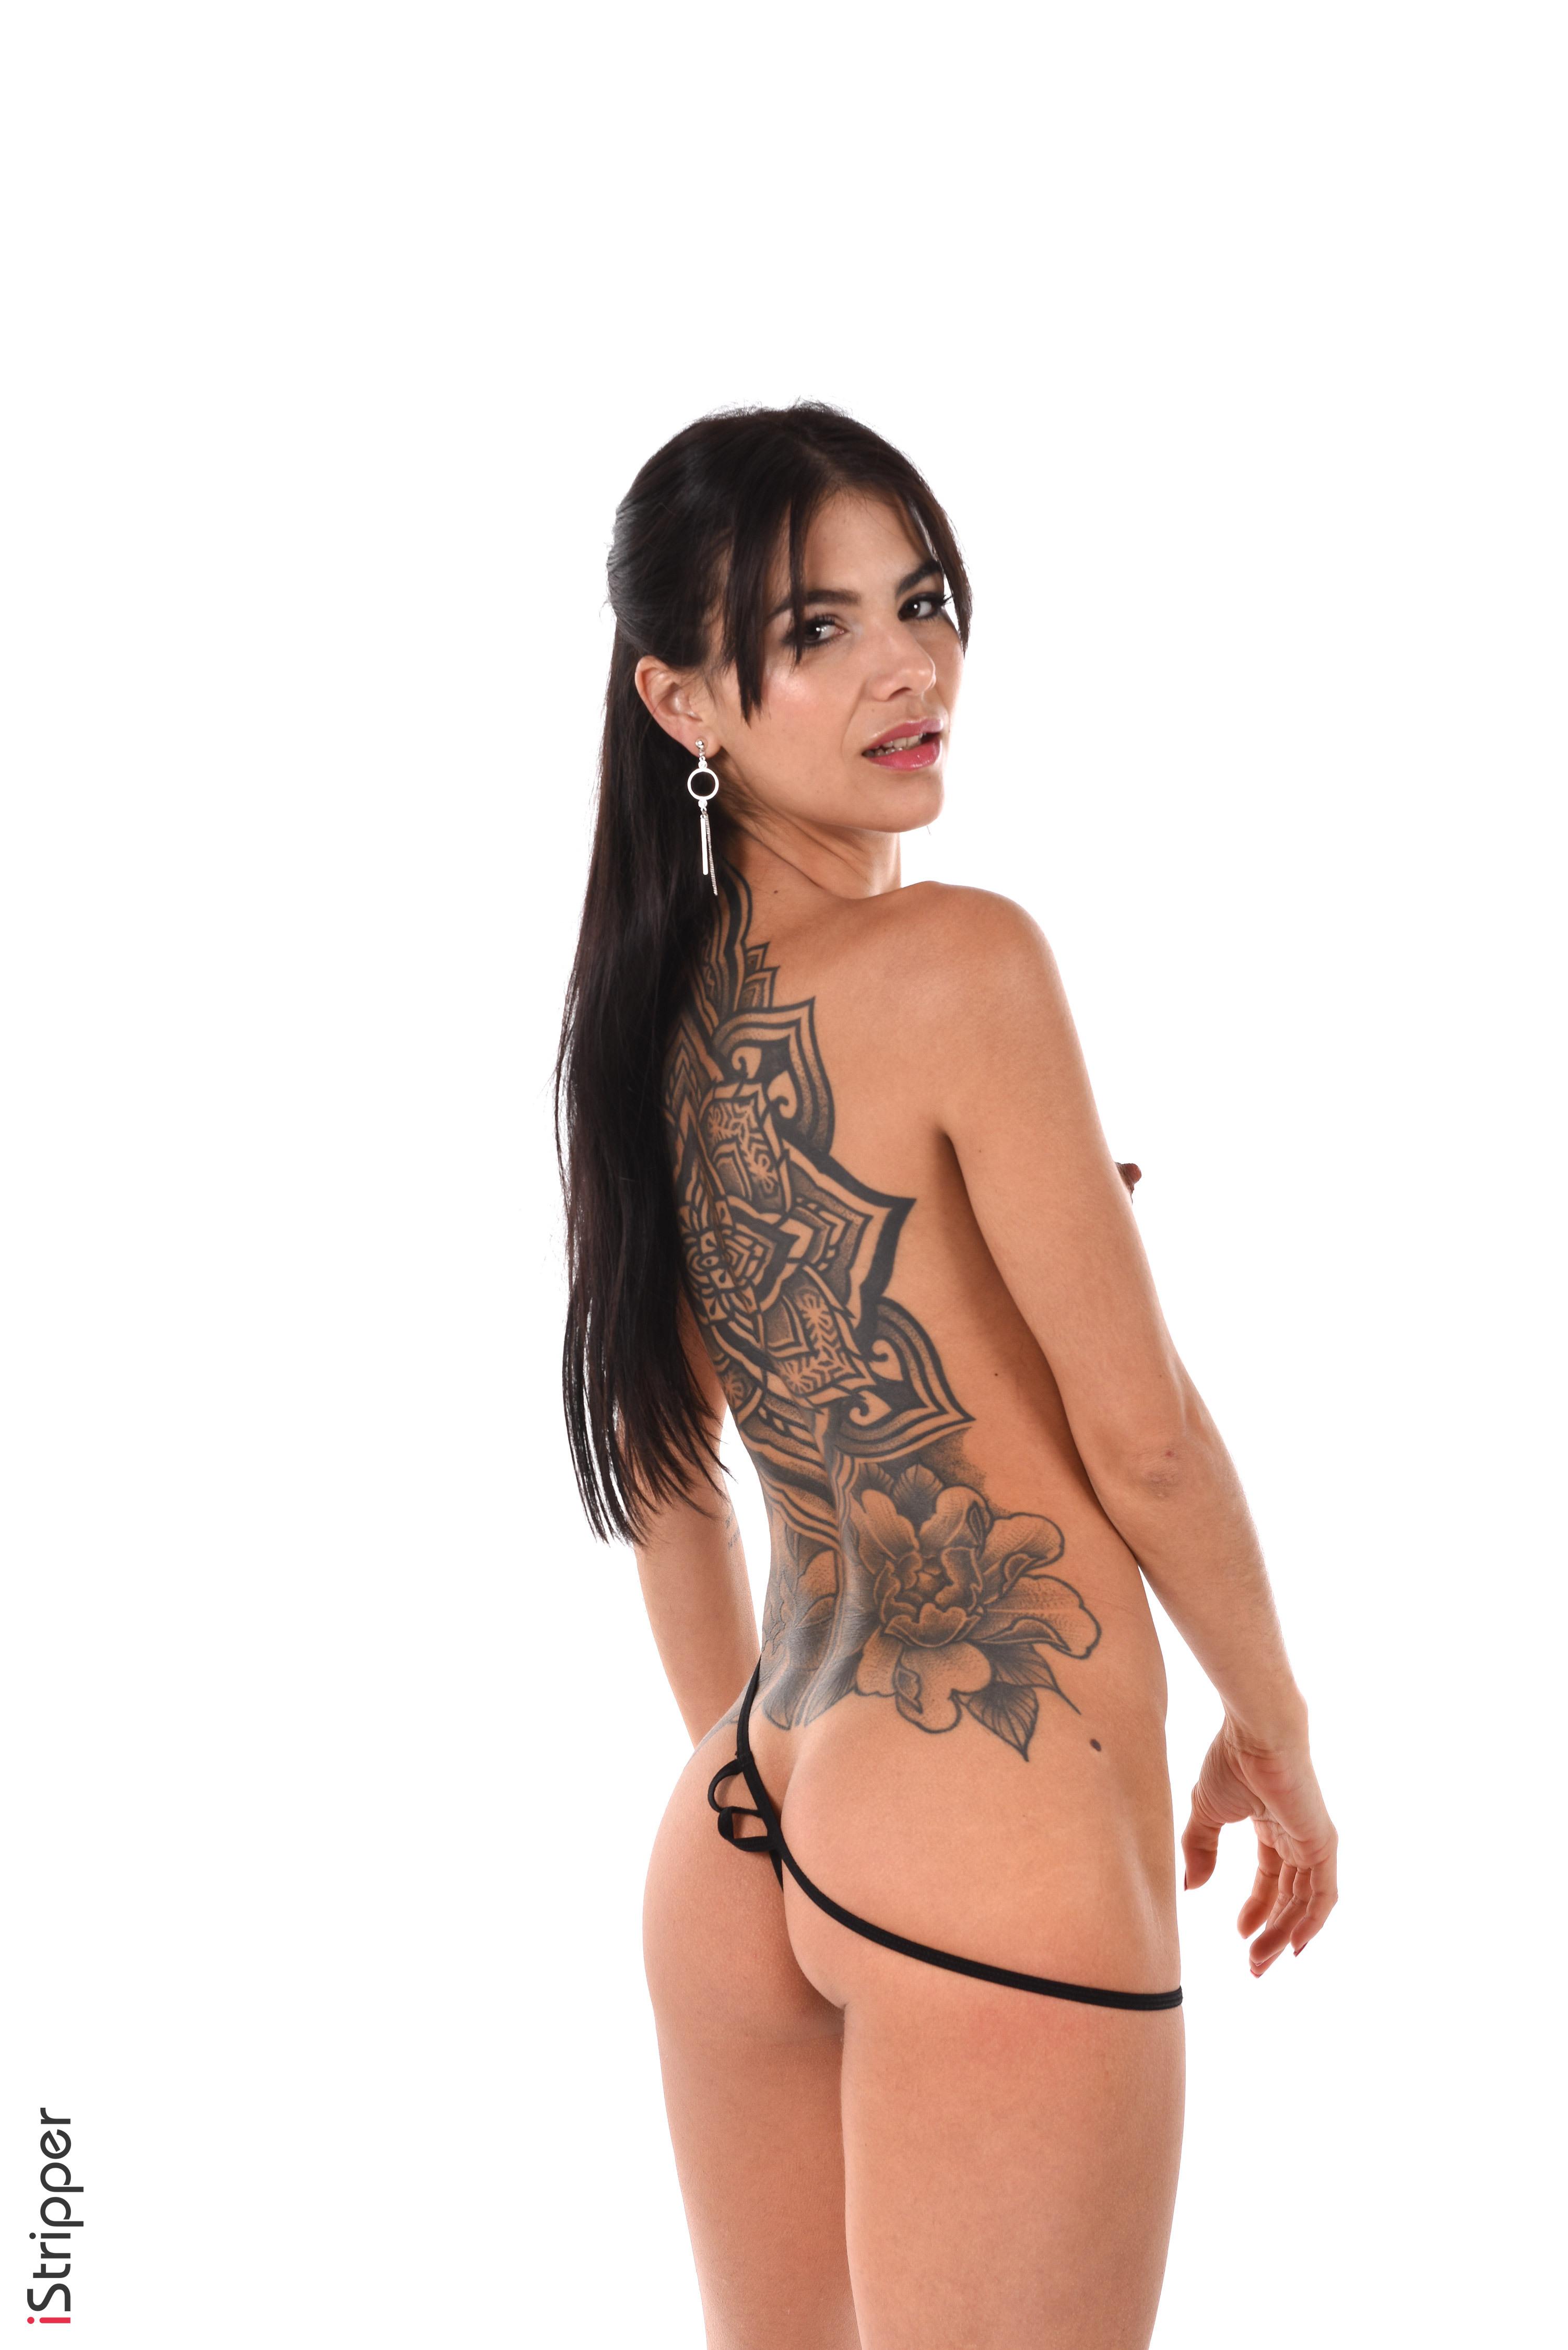 erotic nude wallpapers